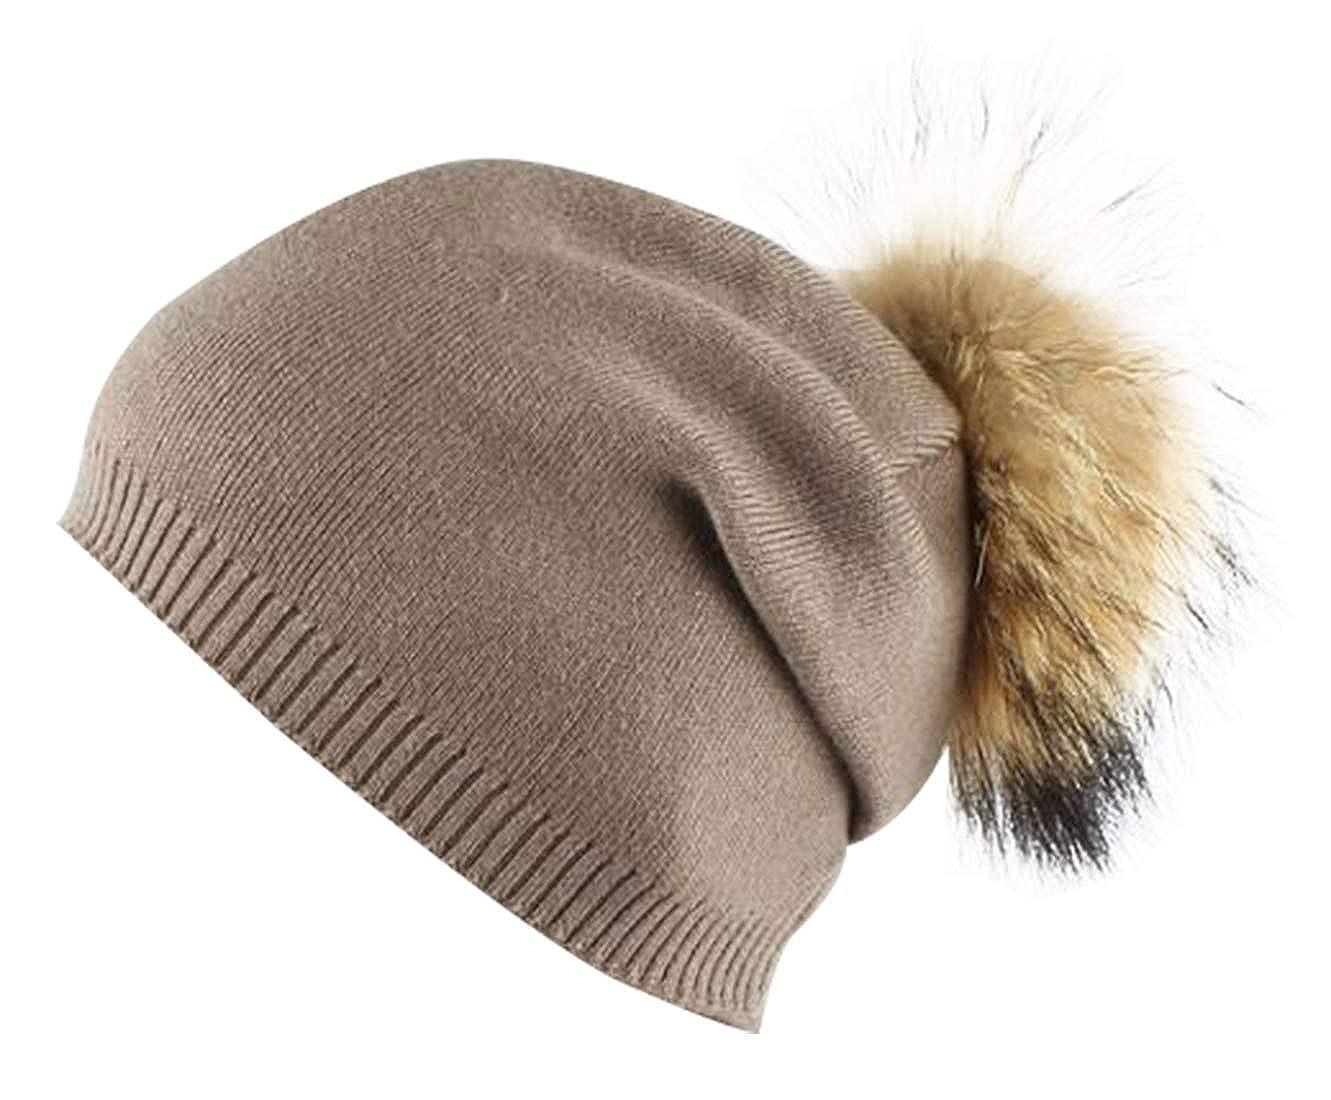 Women Wool Hats Soft Comfortable Classic Fashion Girls Stretchable Artist Hat Aivtalk